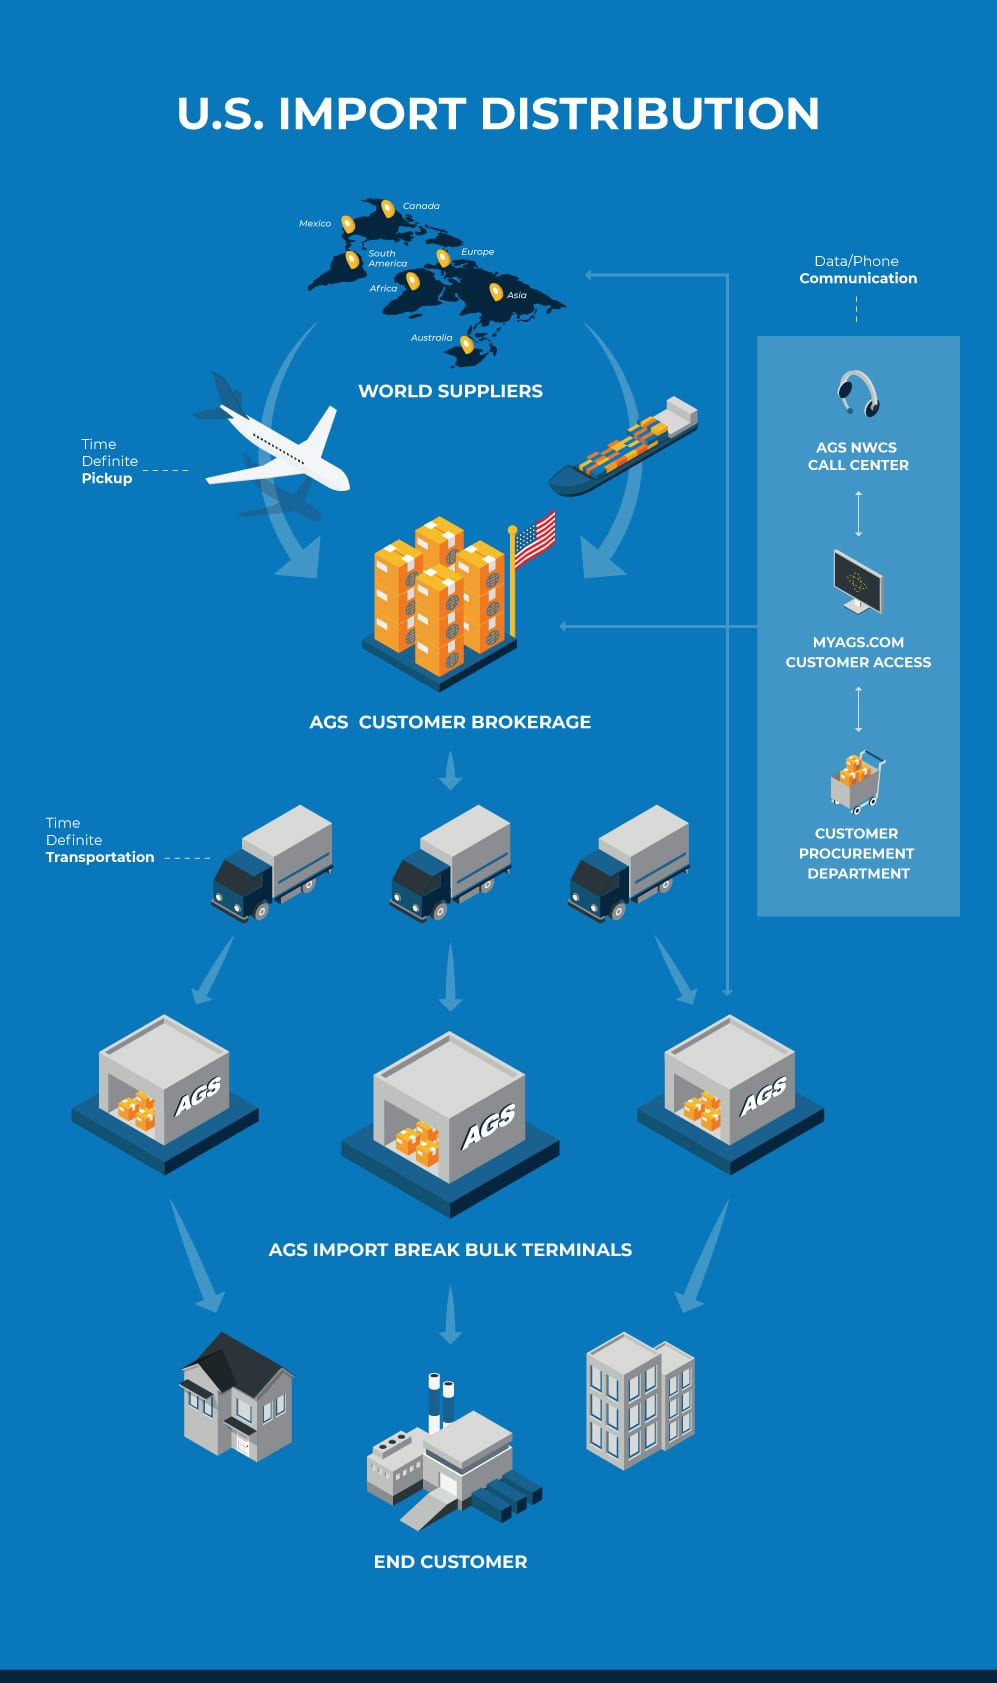 AGS-Flowchart-U.S. Import Distribution